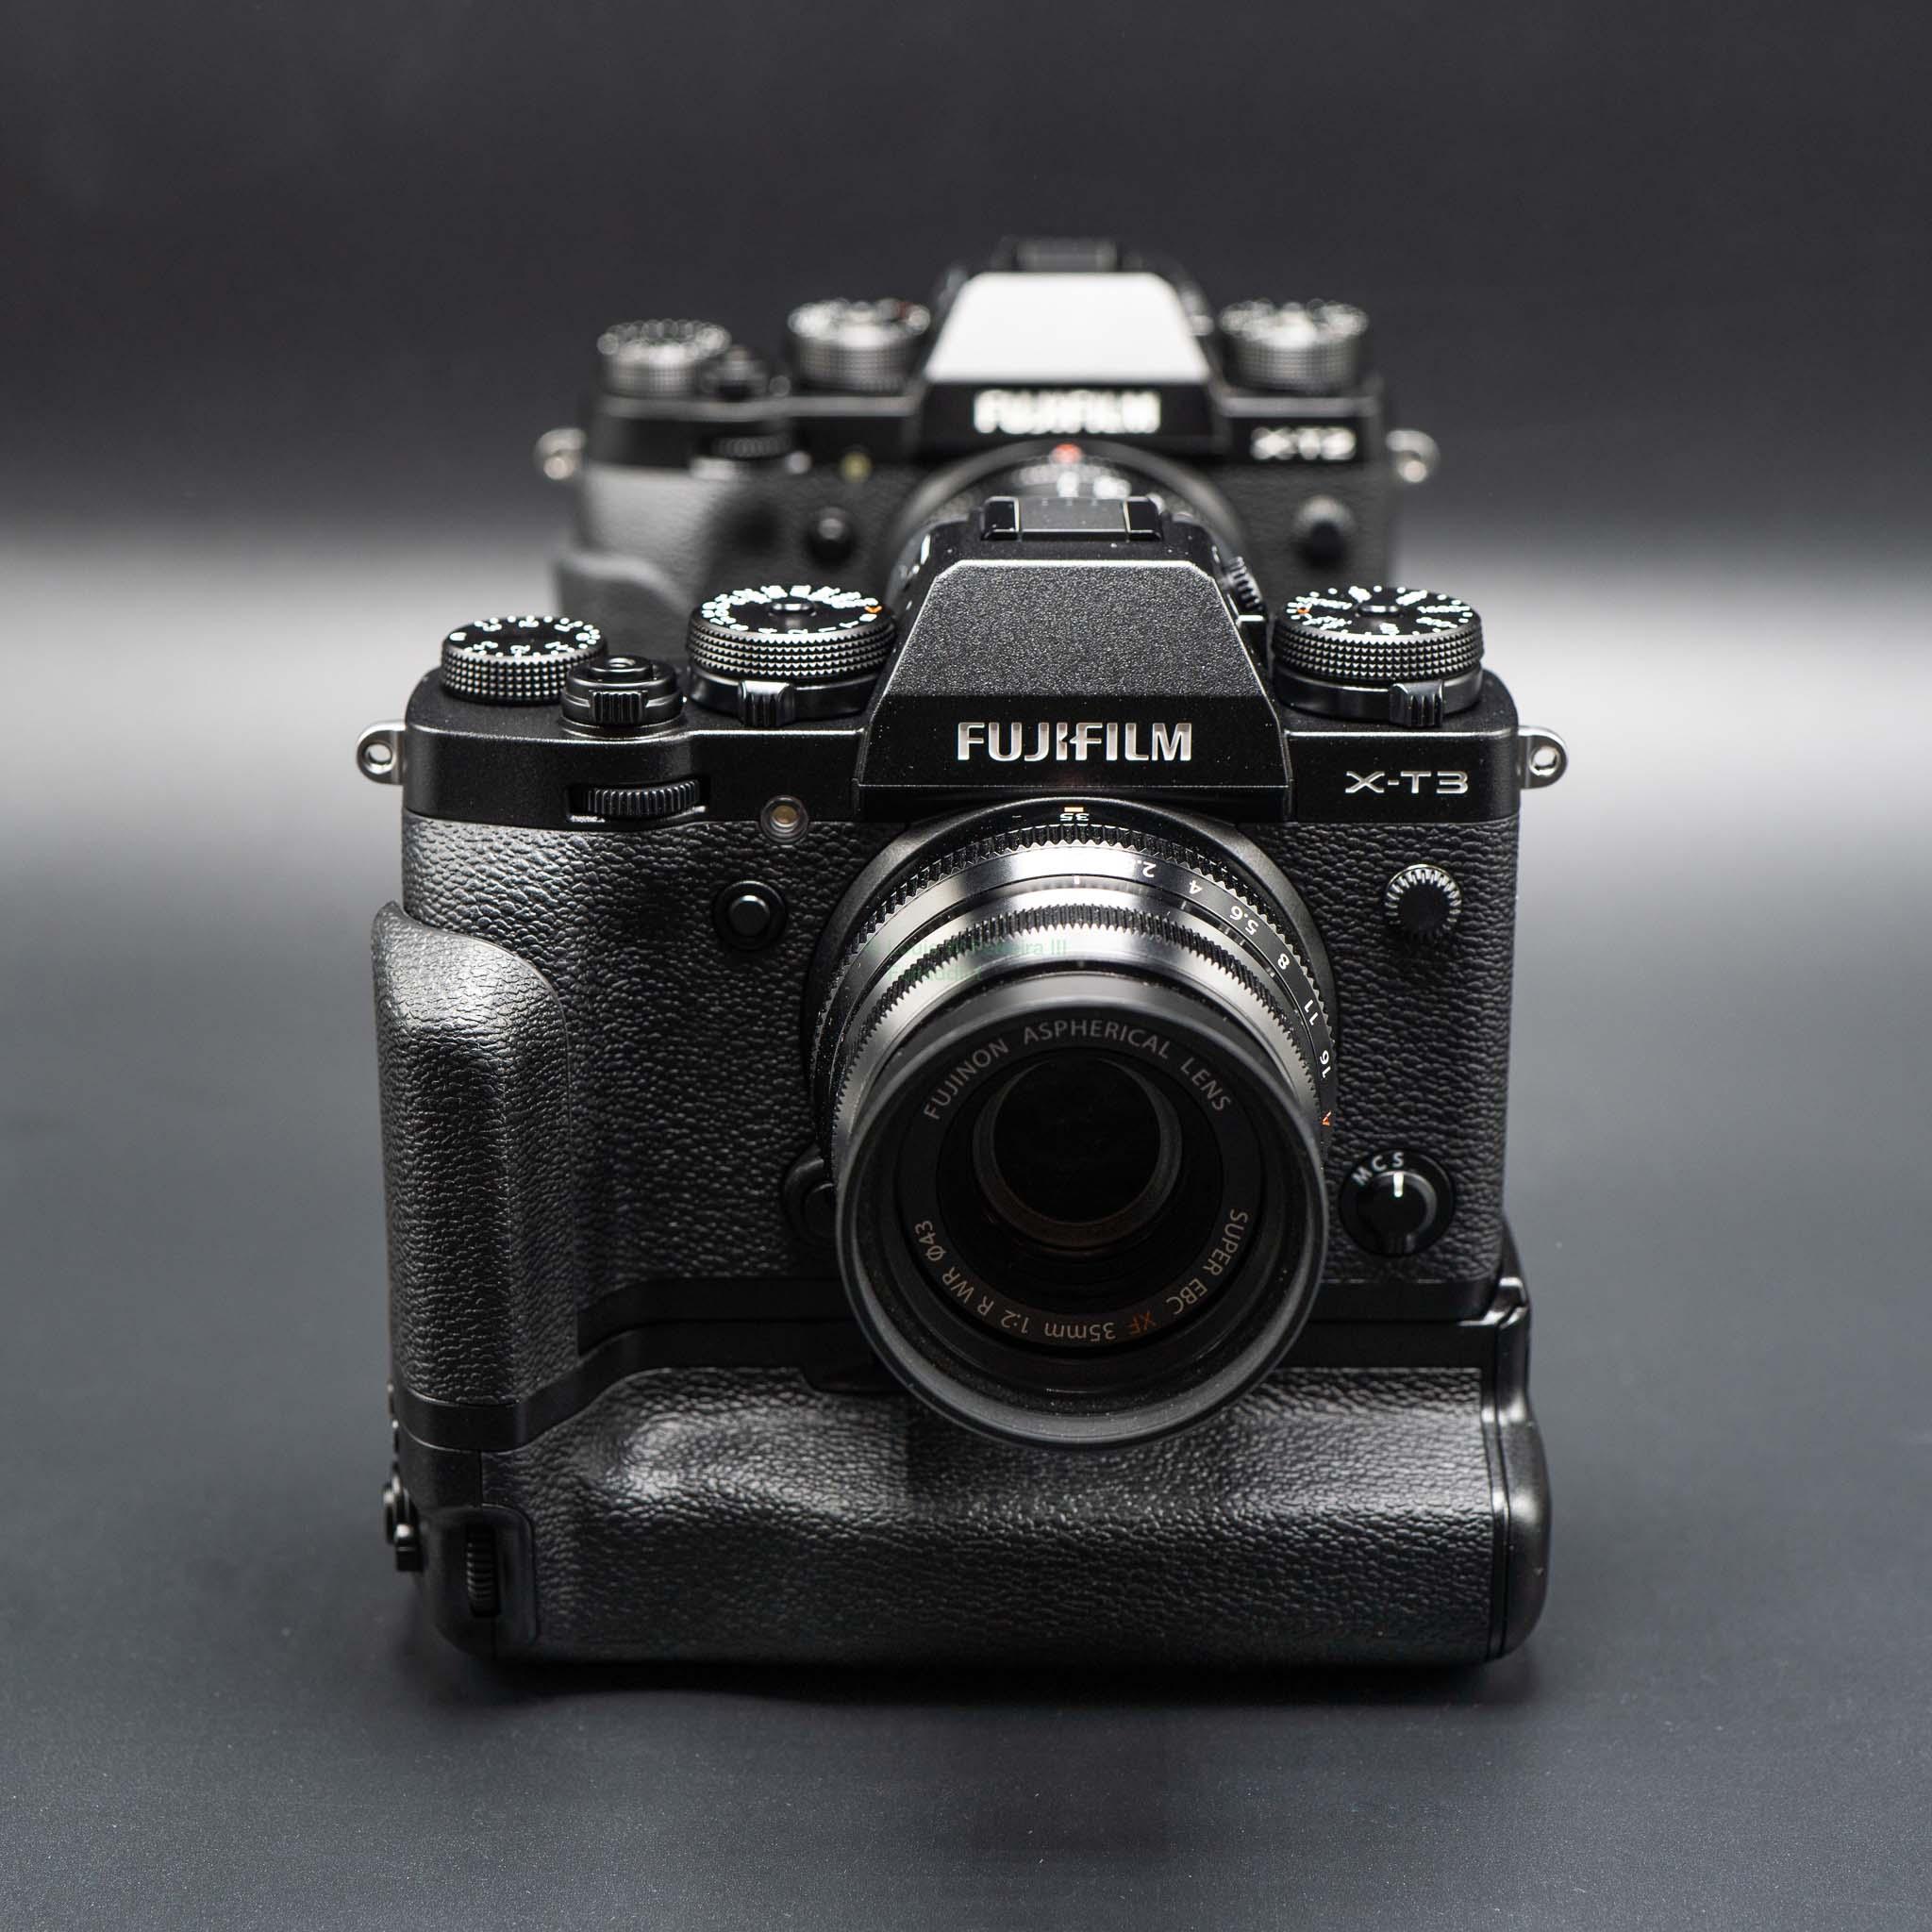 Fujifilm X-T3 Firmware 3 00 Released - Fuji Addict